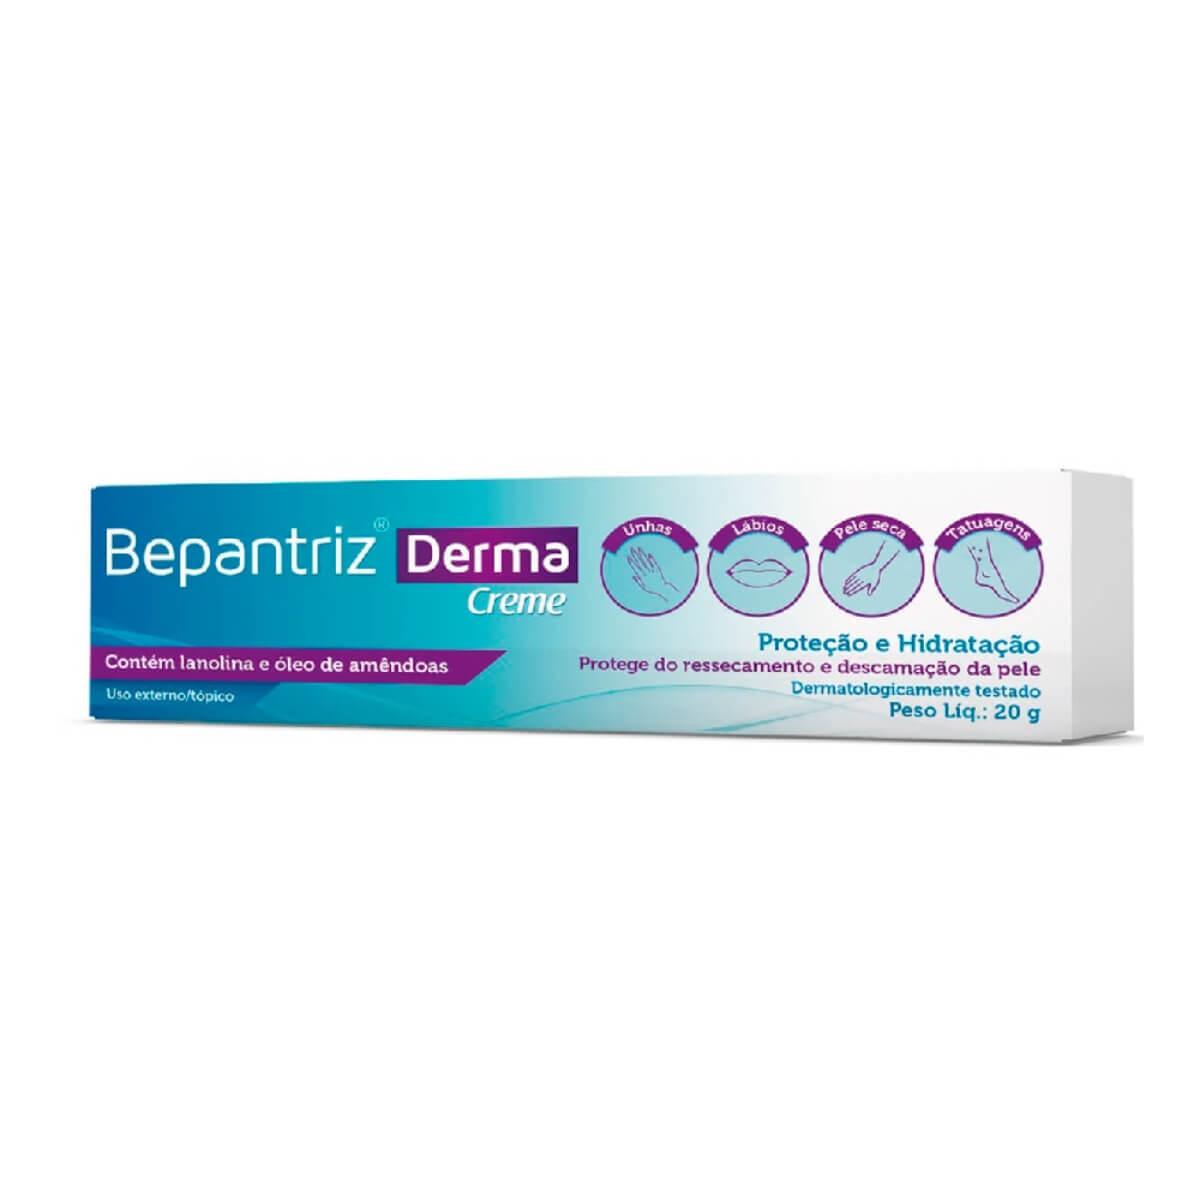 Bepantriz Derma Creme com 20g 20g